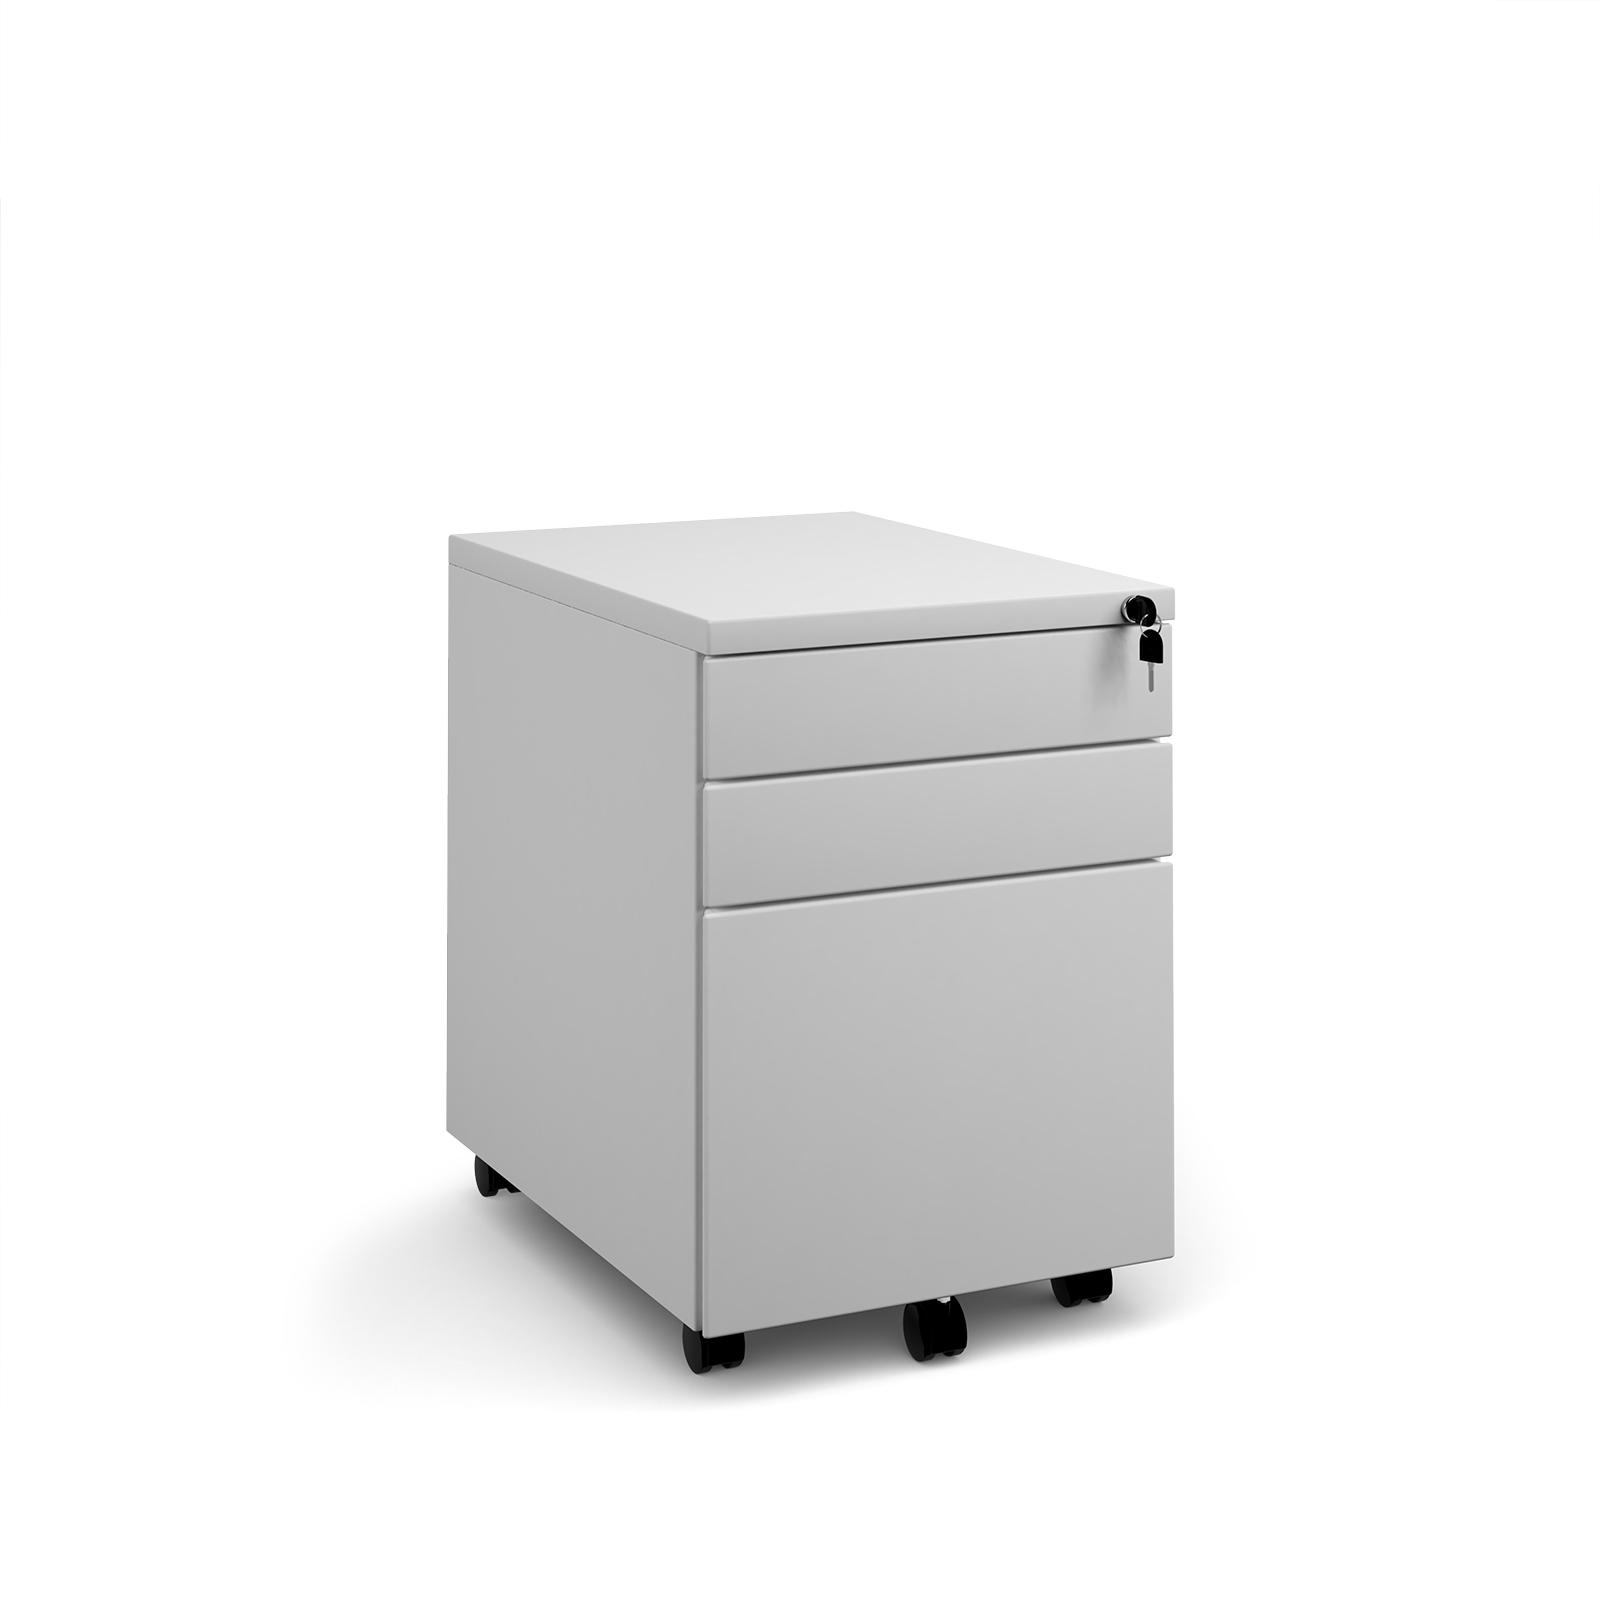 Steel 3 drawer mobile pedestal - white